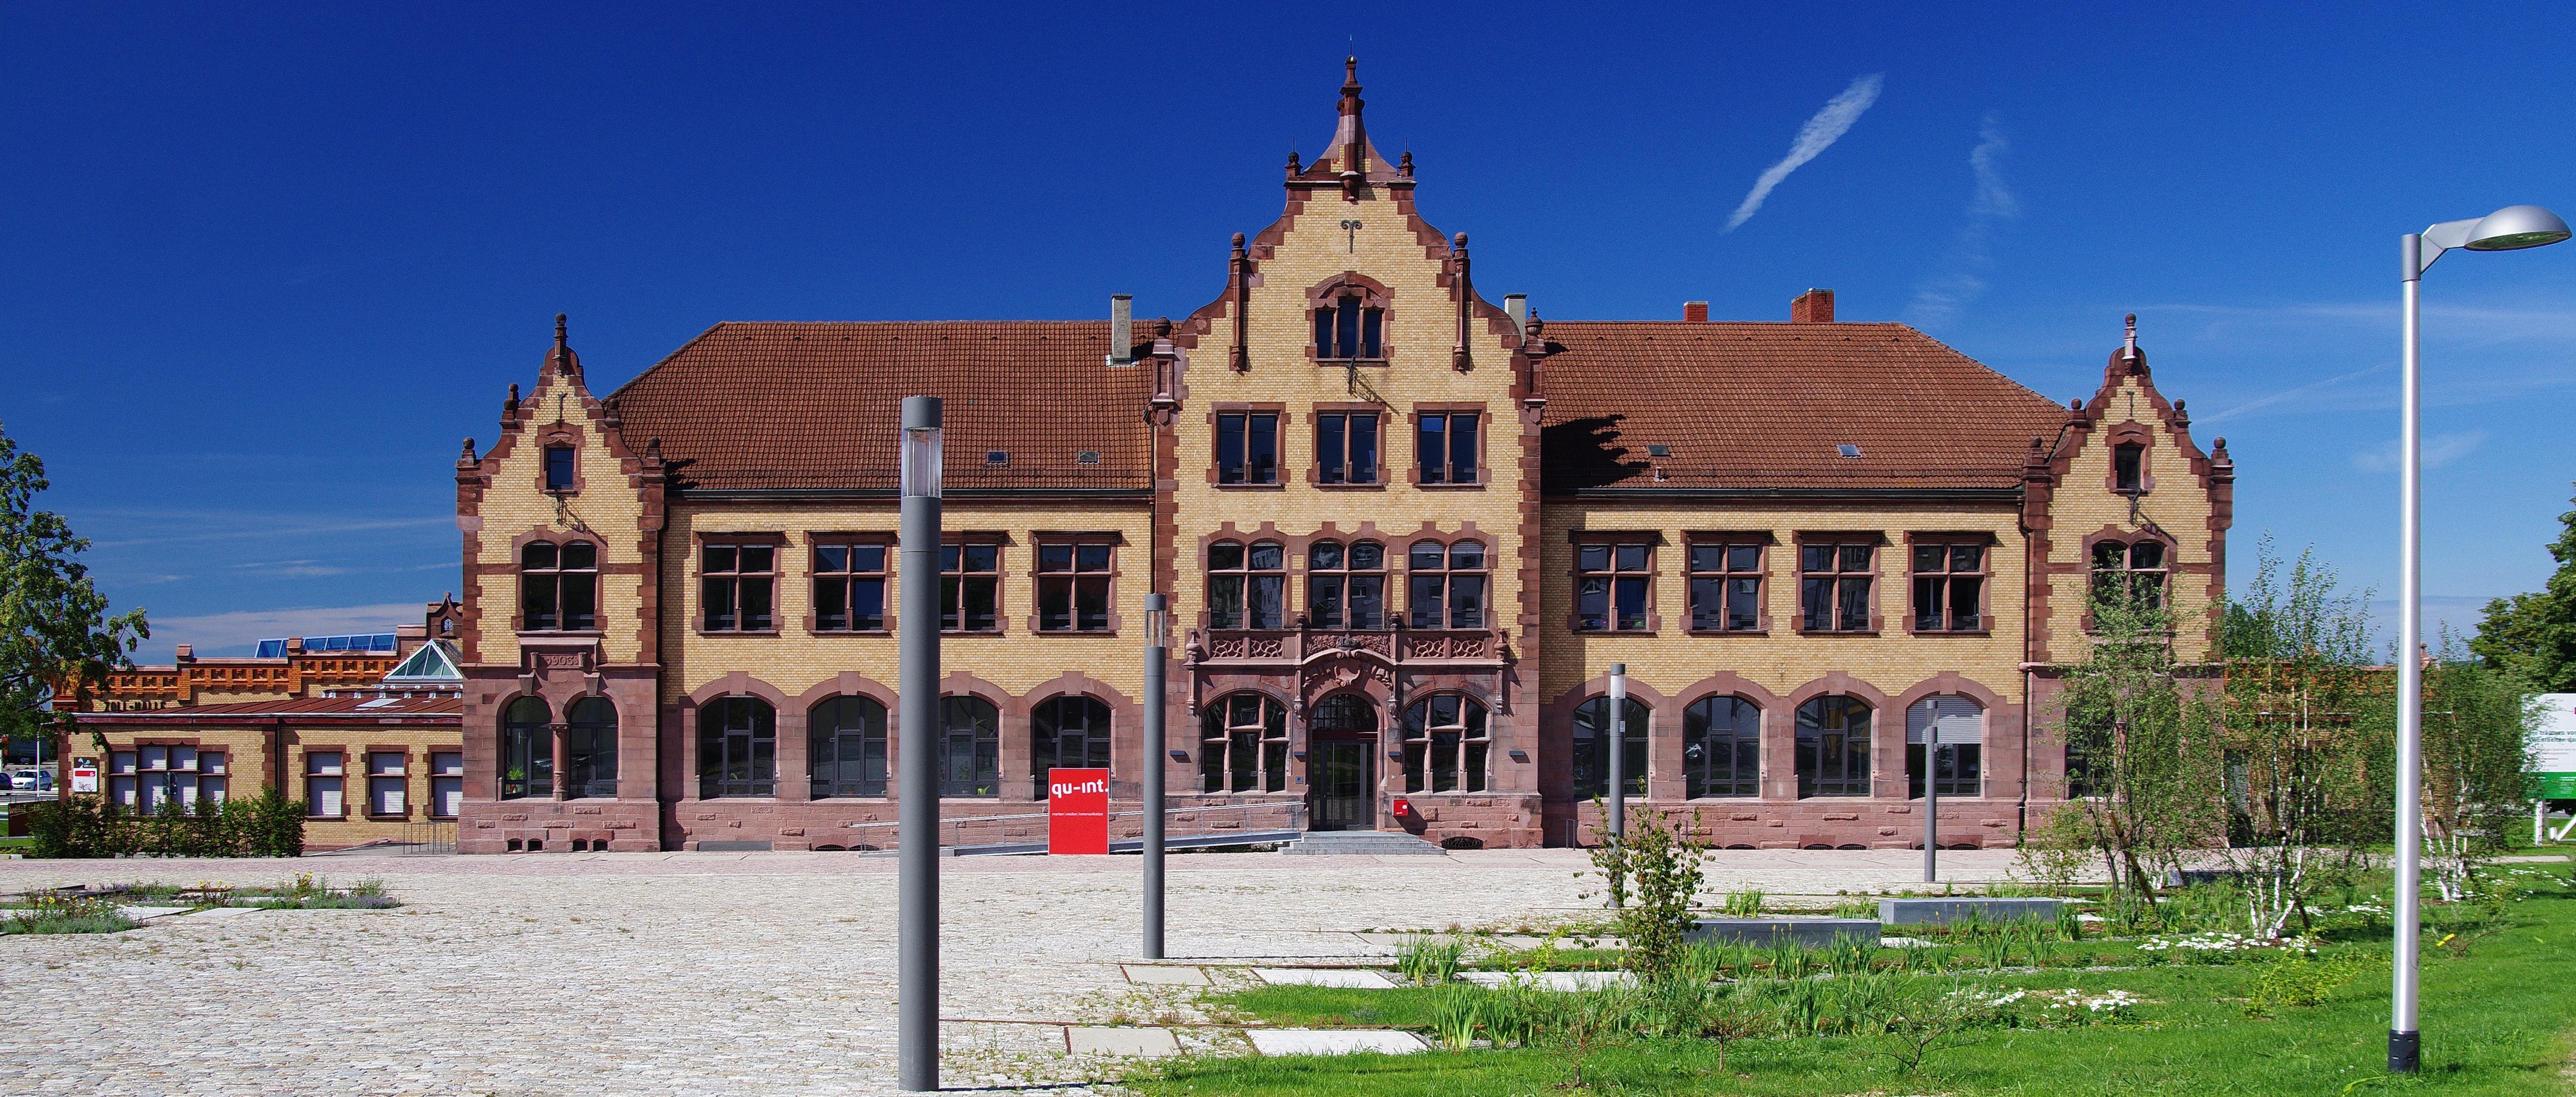 freiburg alter güterbahnhof